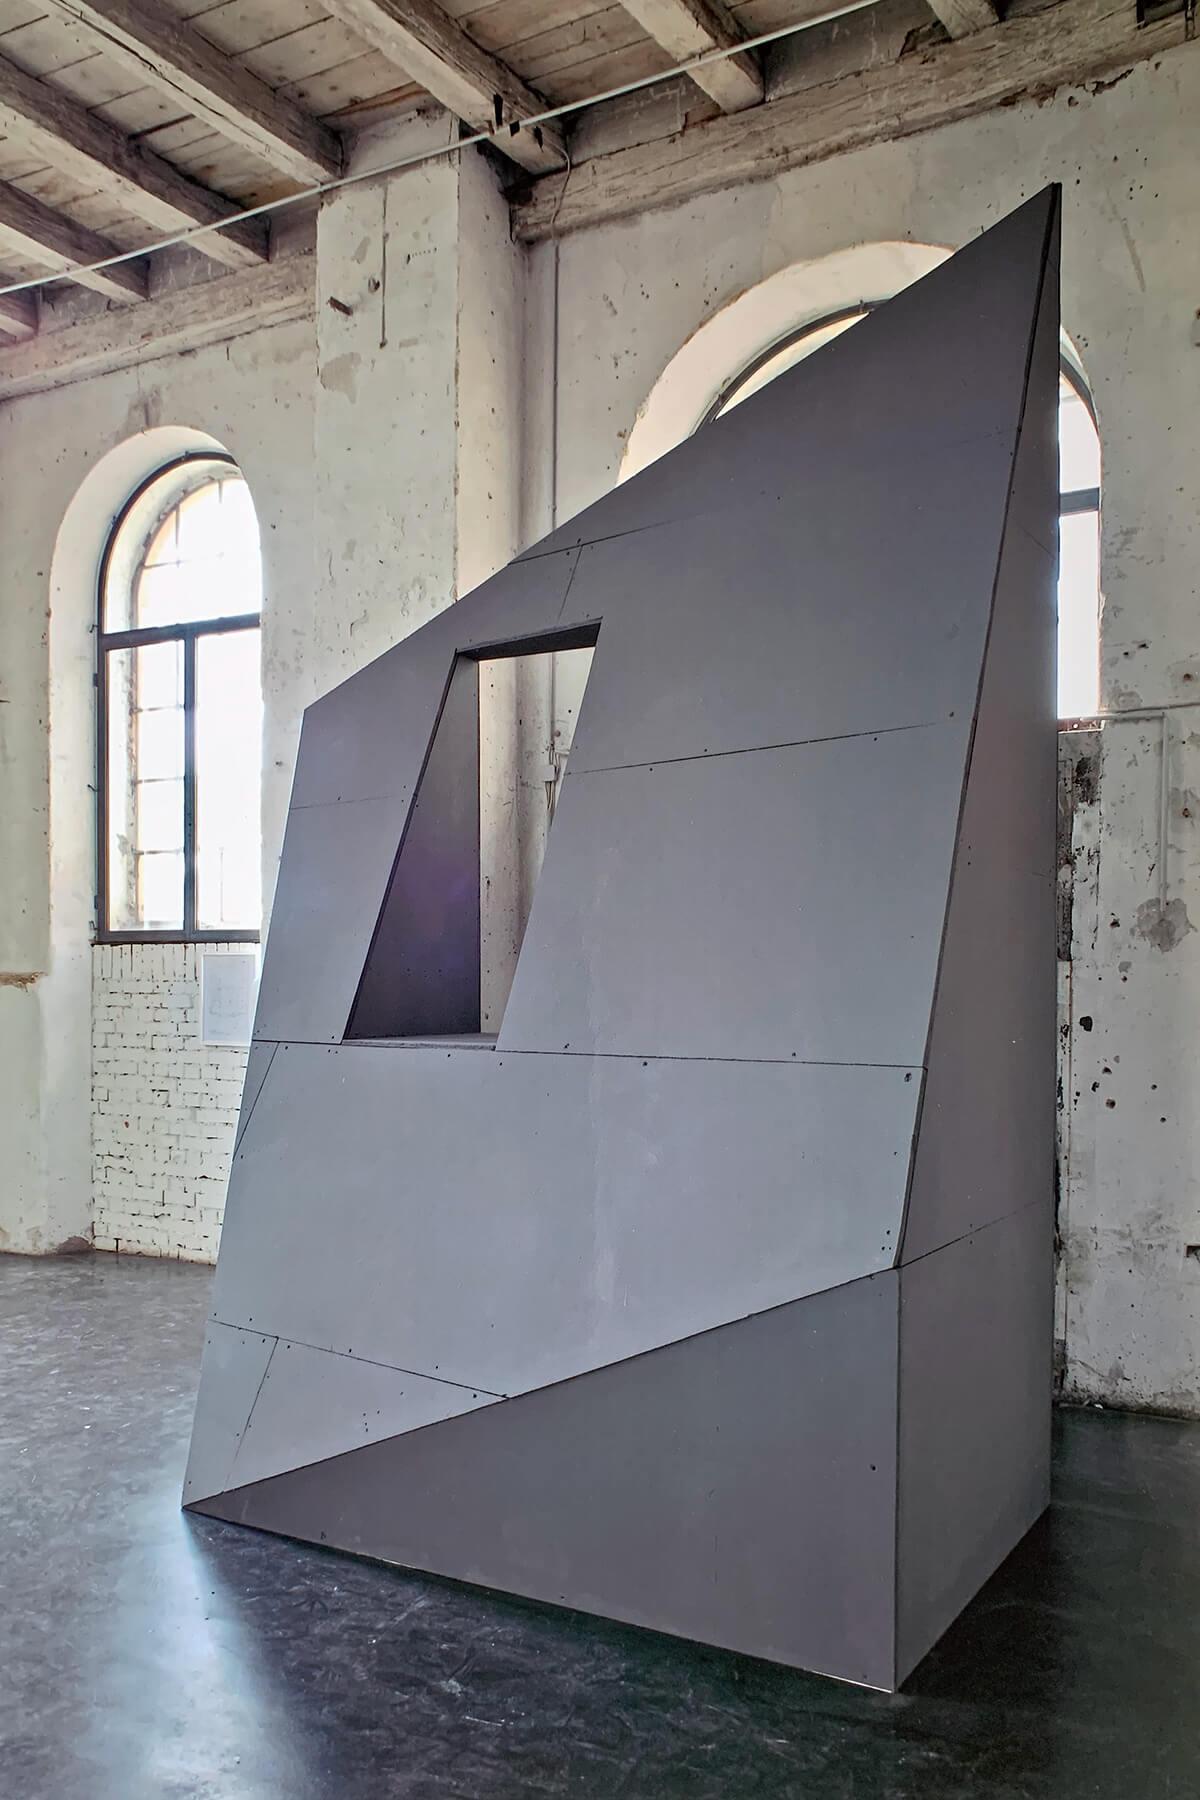 Bildhauer OMI Riesterer Karlsruhe Projekte Großes Fenster Orgelfabrik Durlach